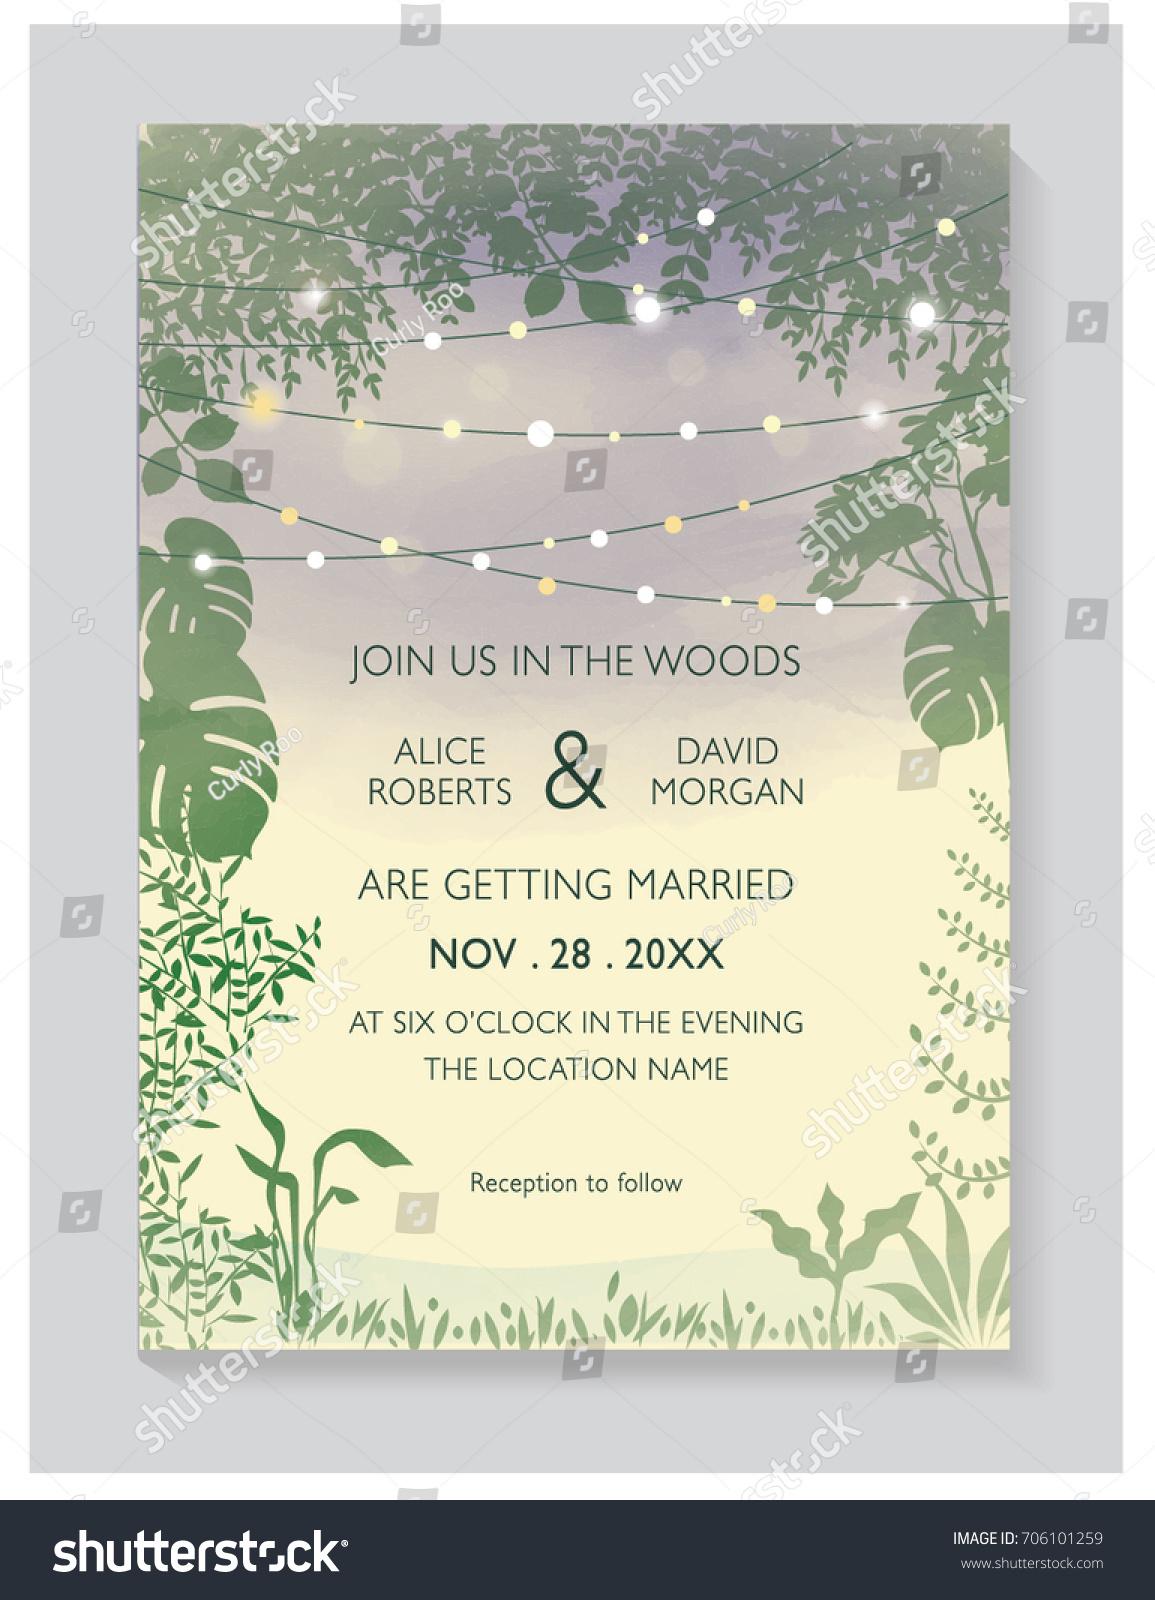 WEDDING INVITATION CARD Wedding Woods Concept Stock Photo (Photo ...